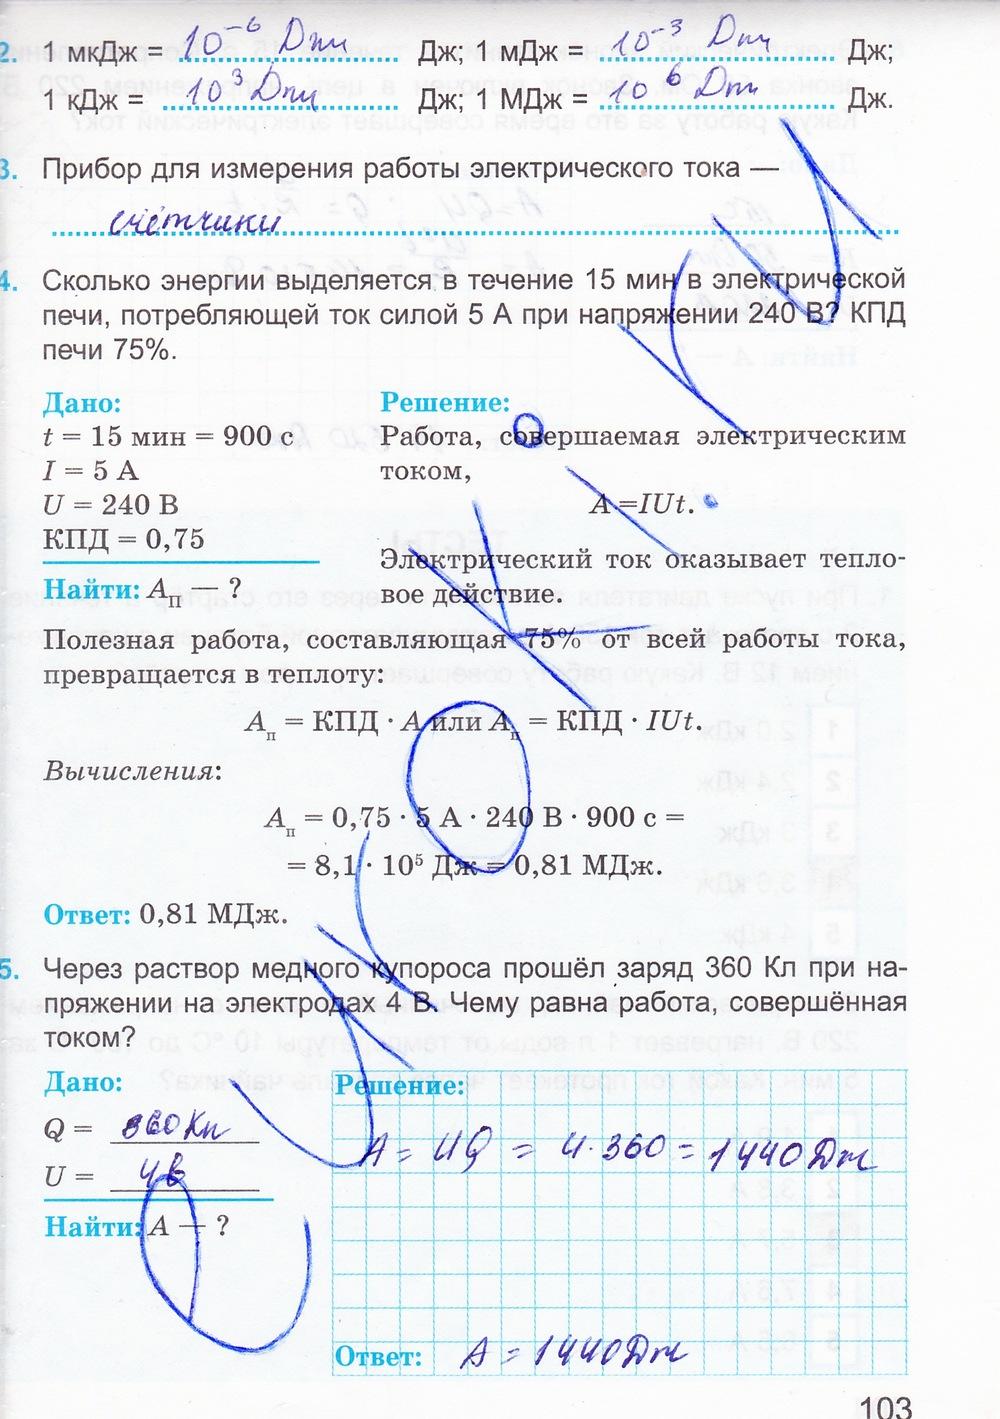 физика в ф дмитриева гдз скачать